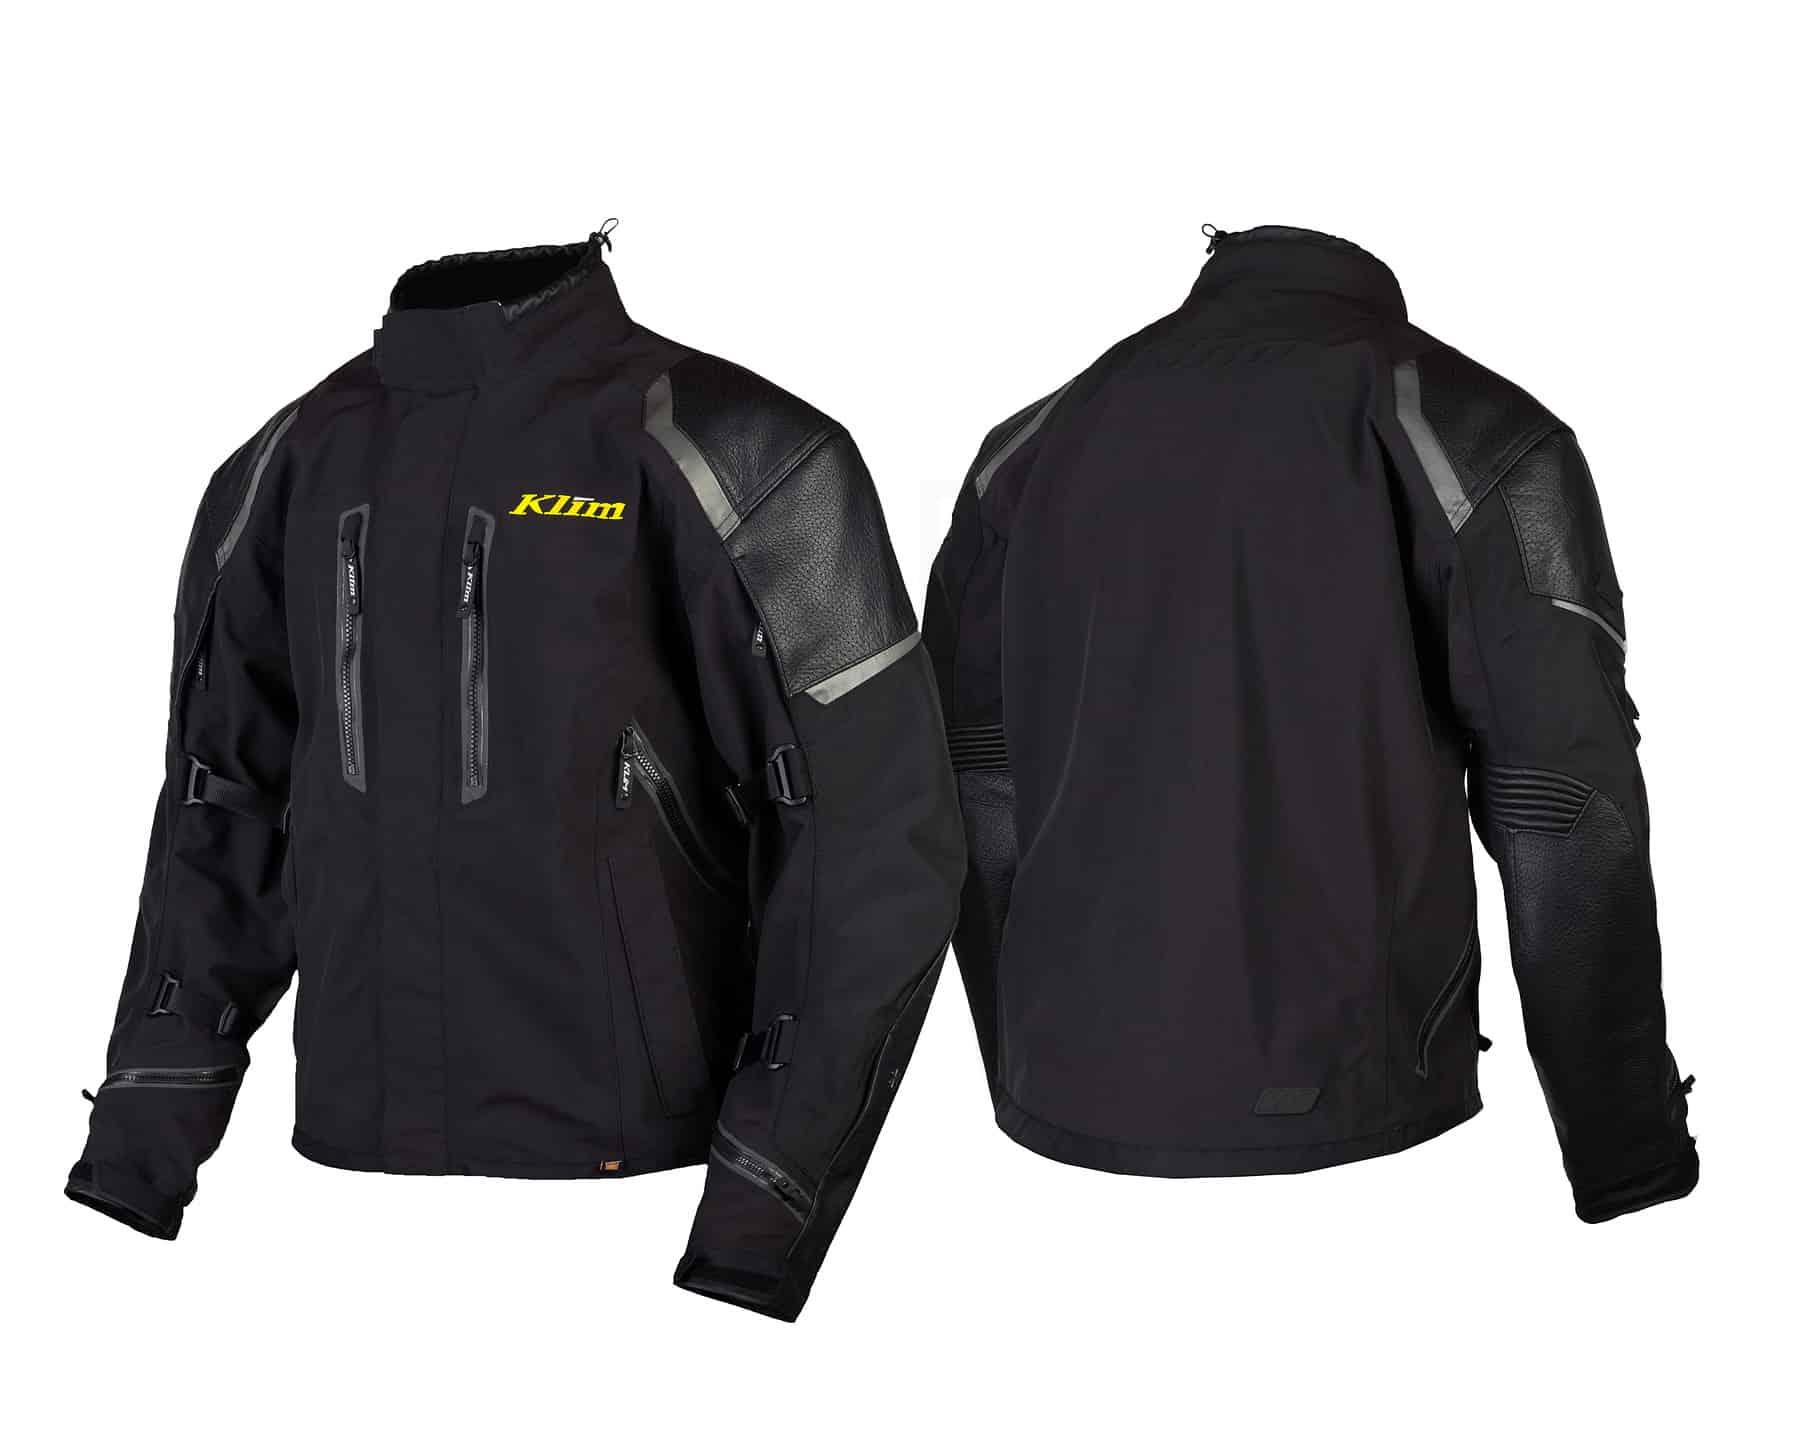 S Apex Jacket 3052-000-000_01